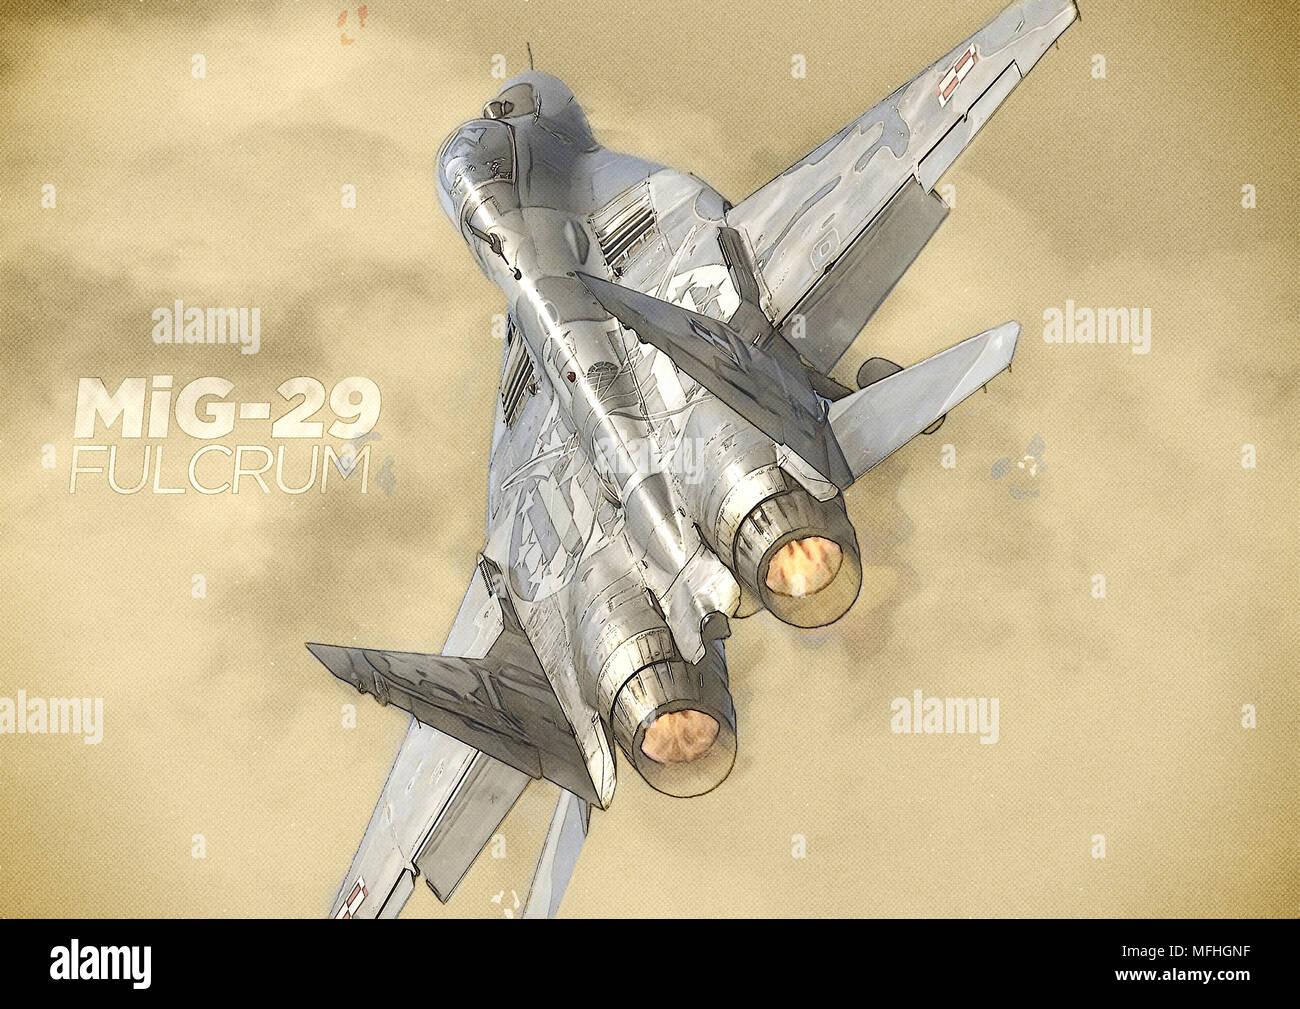 Aviation Wall Art Stock Photos & Aviation Wall Art Stock Images - Alamy